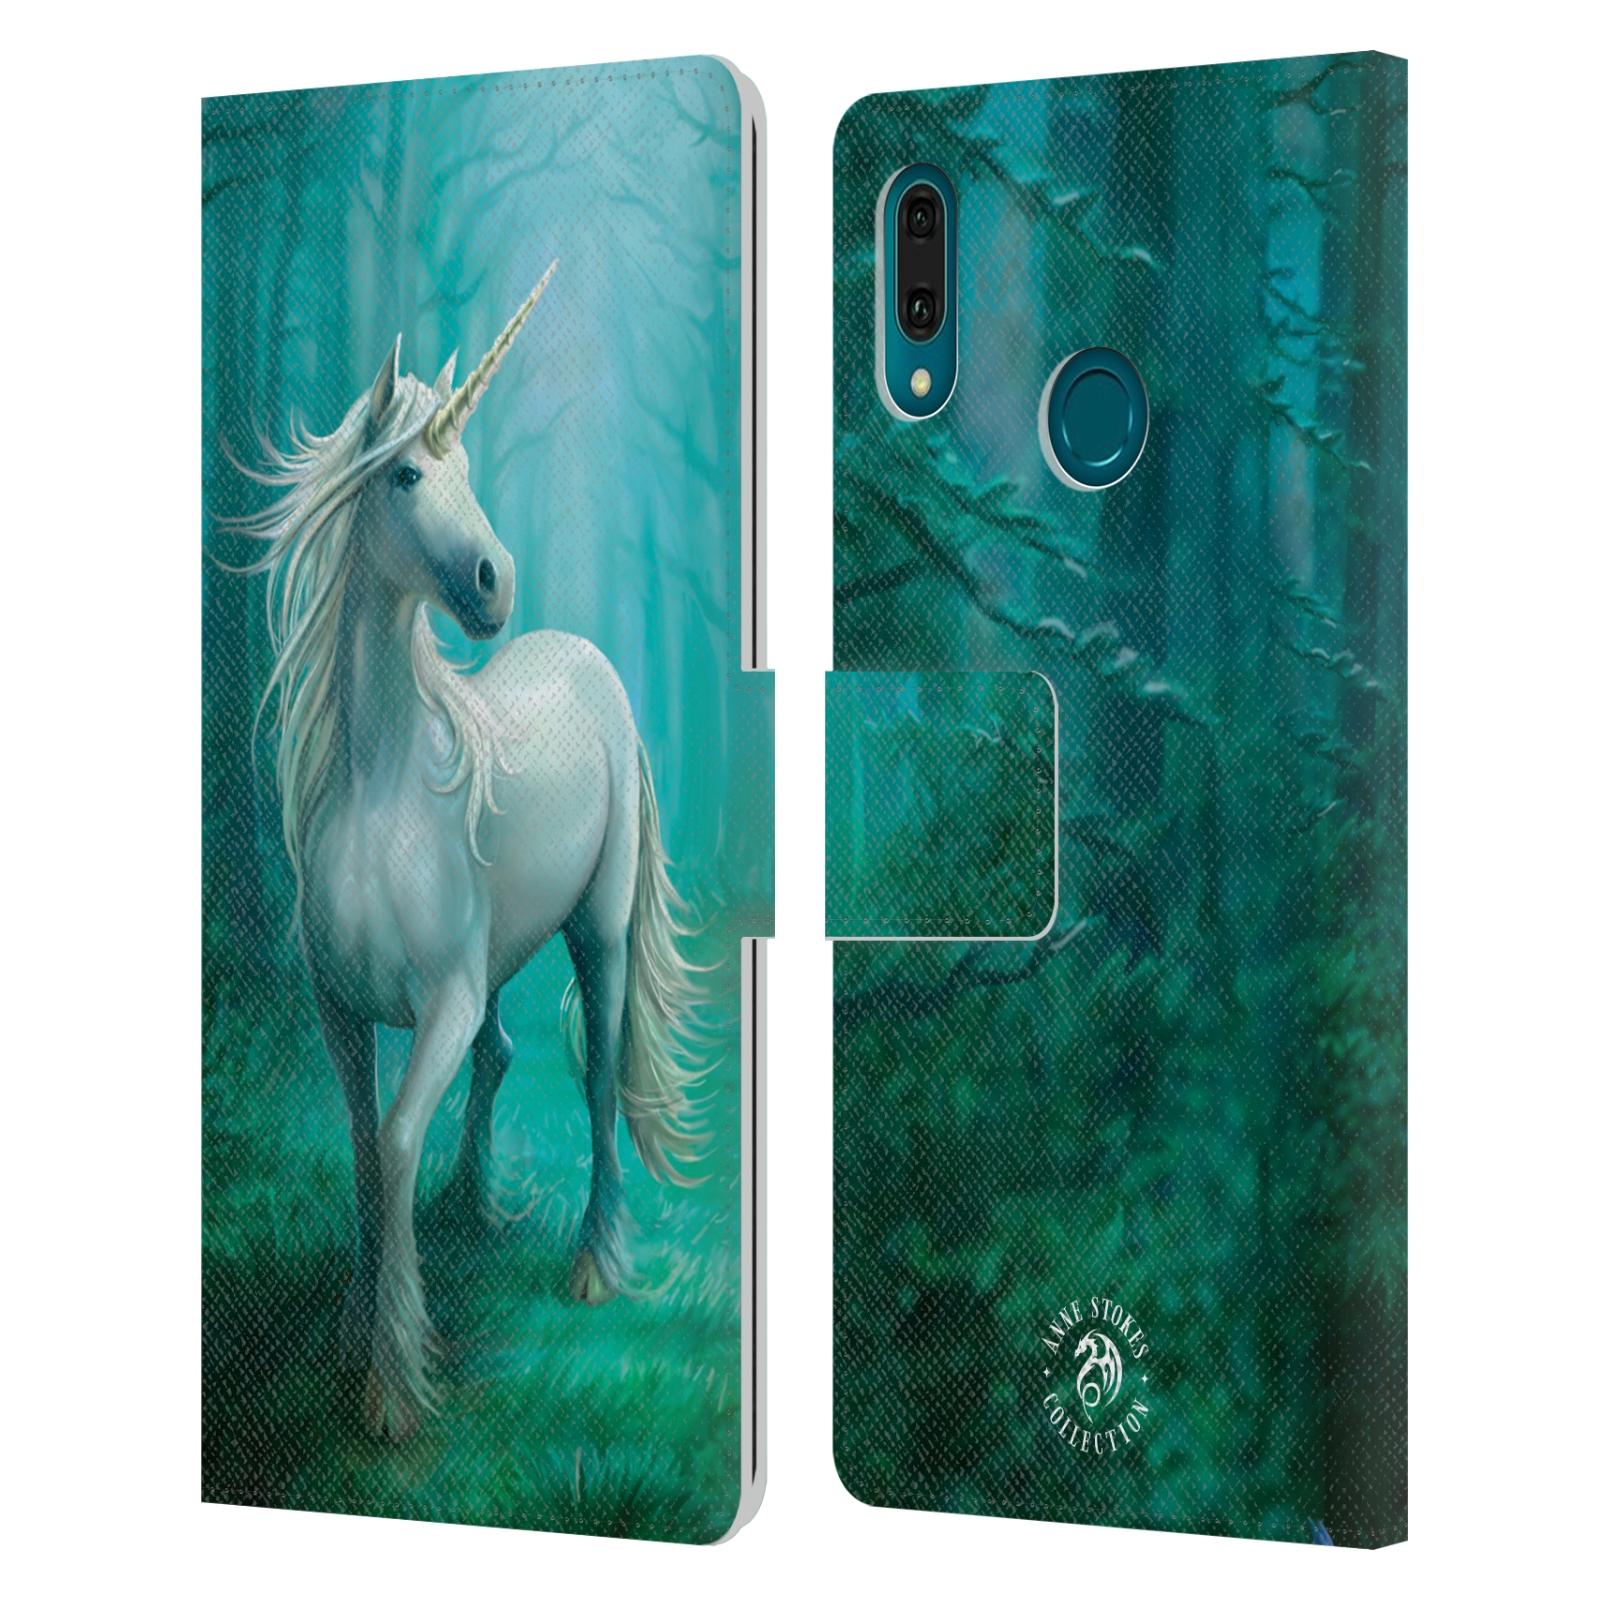 Pouzdro na mobil Huawei Y9 2019 - Head Case - fantasy - jednorožec v lese